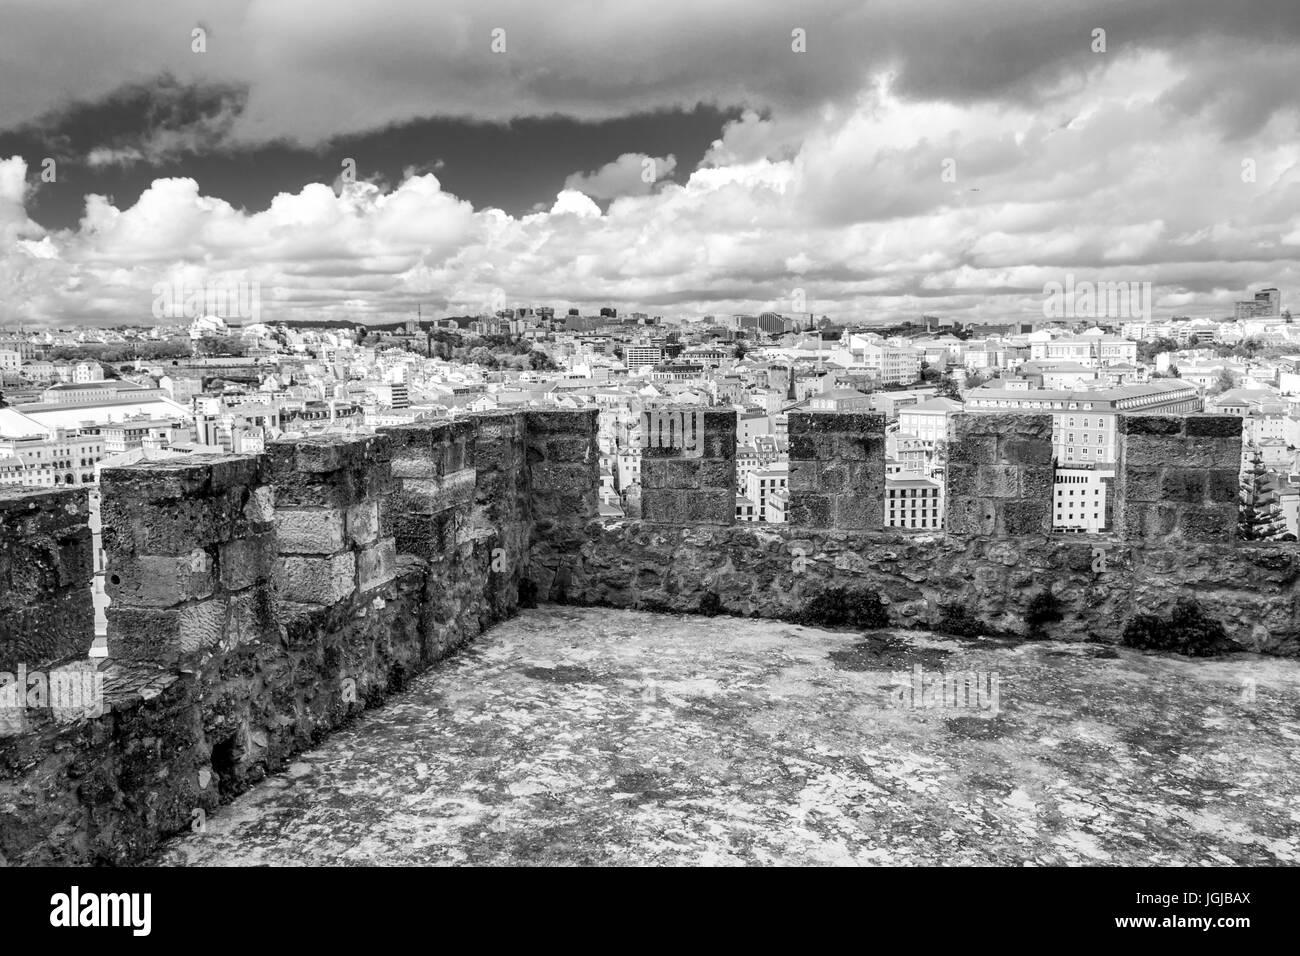 Castelo de Sao Jorge is located on a hilltop overlooking historic Lisbon (Portugal) - Stock Image